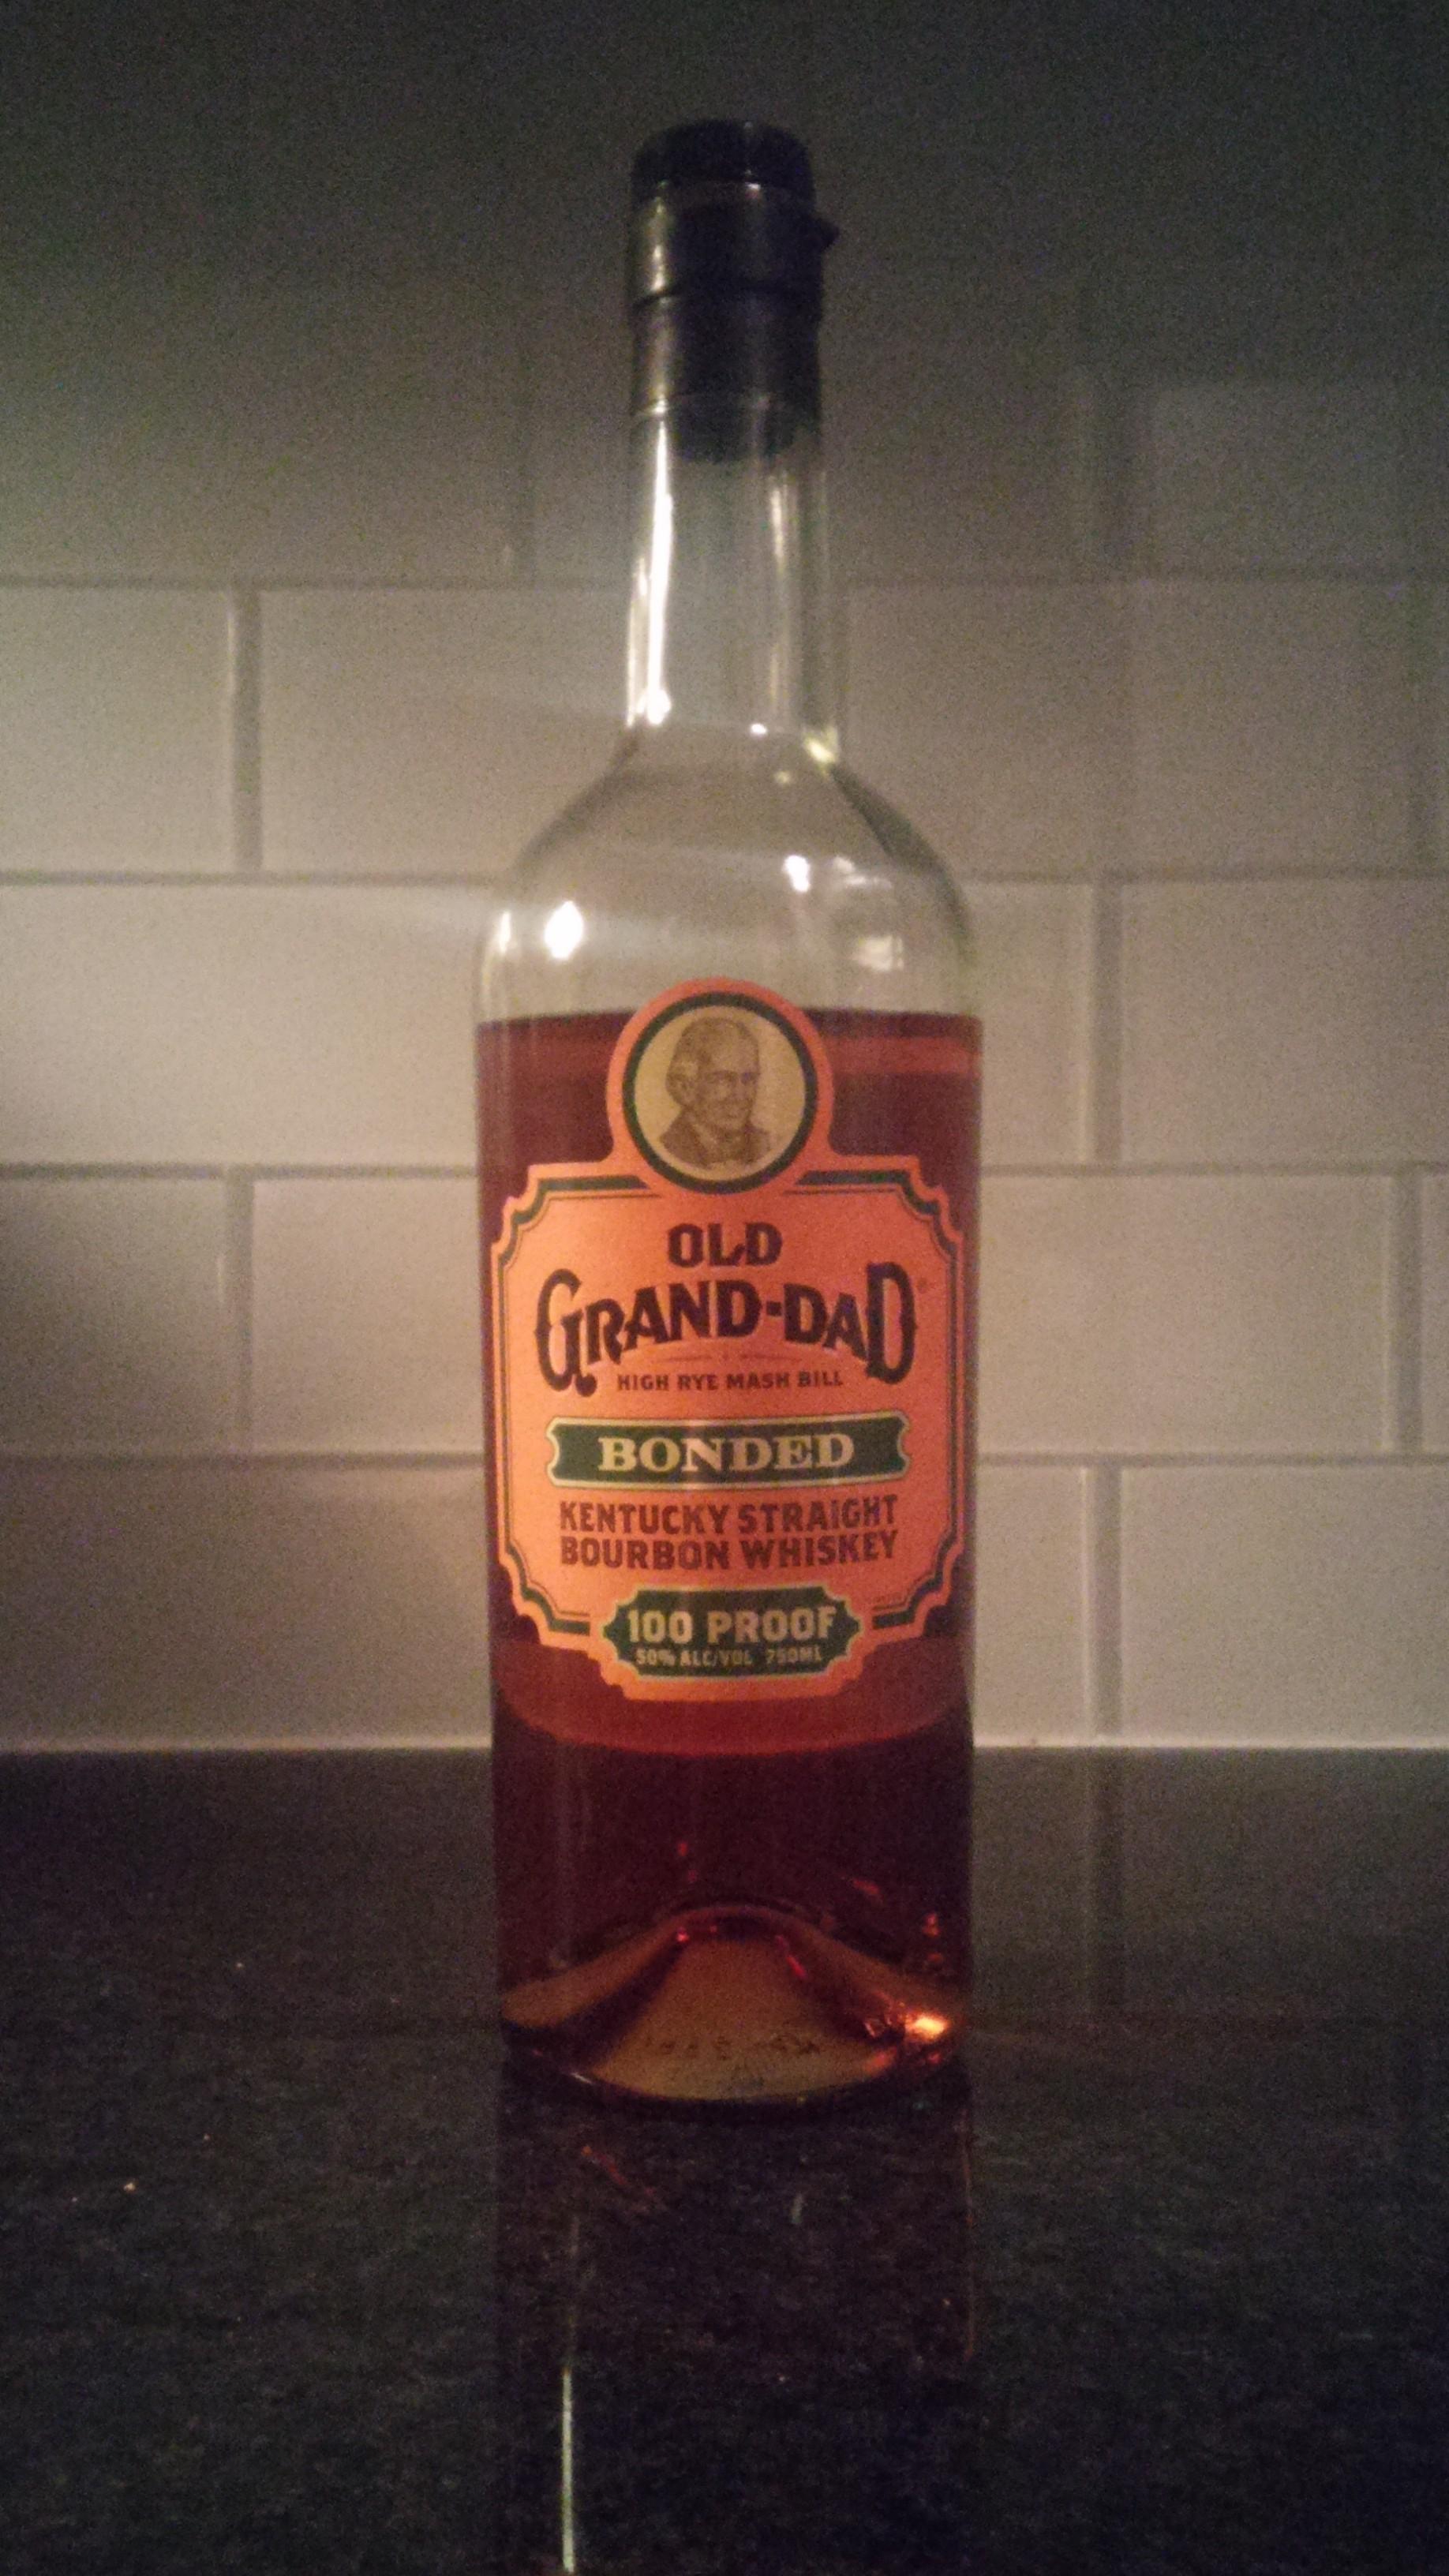 Old Grand-Dad Bonded Bourbon